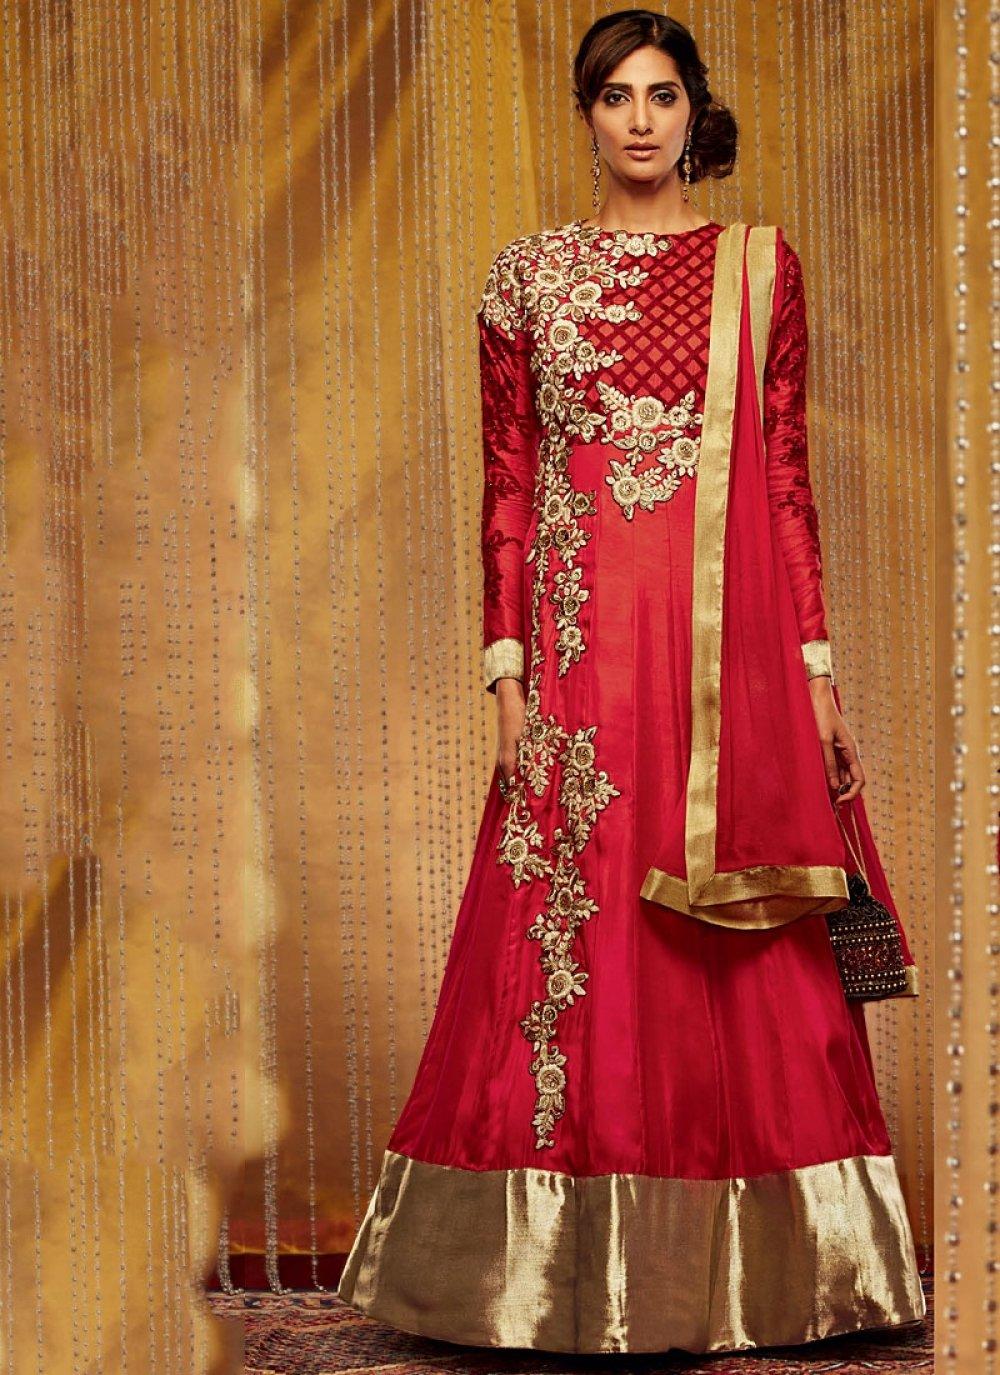 Red Resham Work Faux Georgette Anarkali Suit